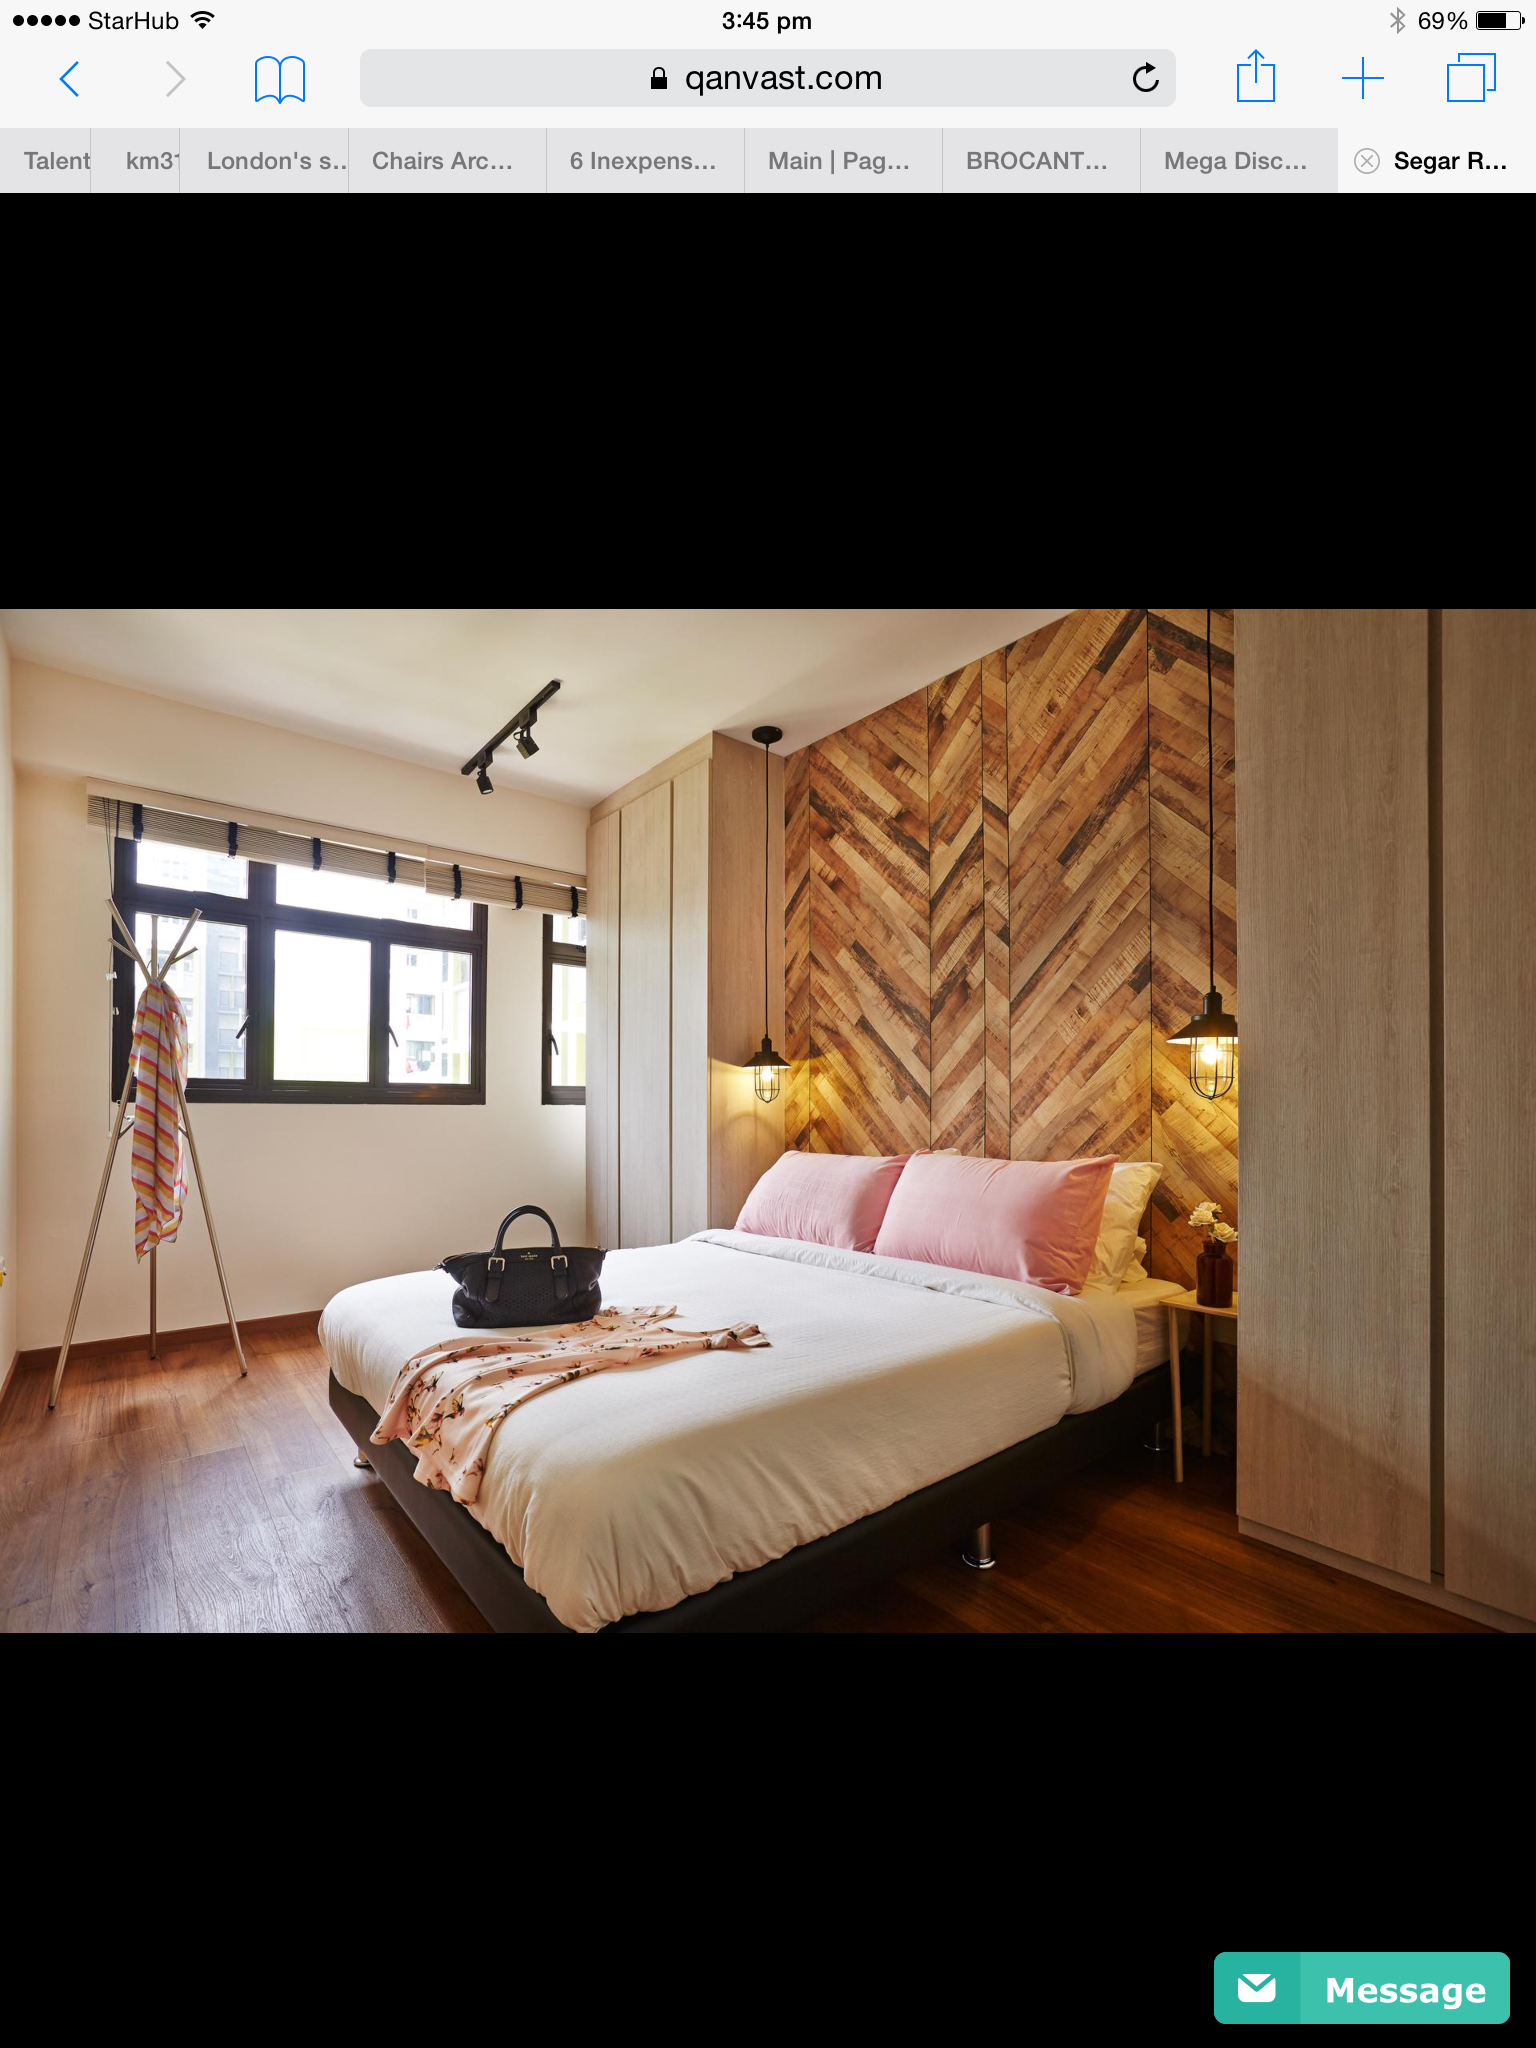 4 room bto master bedroom design  Pin by Dede Wu on JC Residence Idea Board  Pinterest